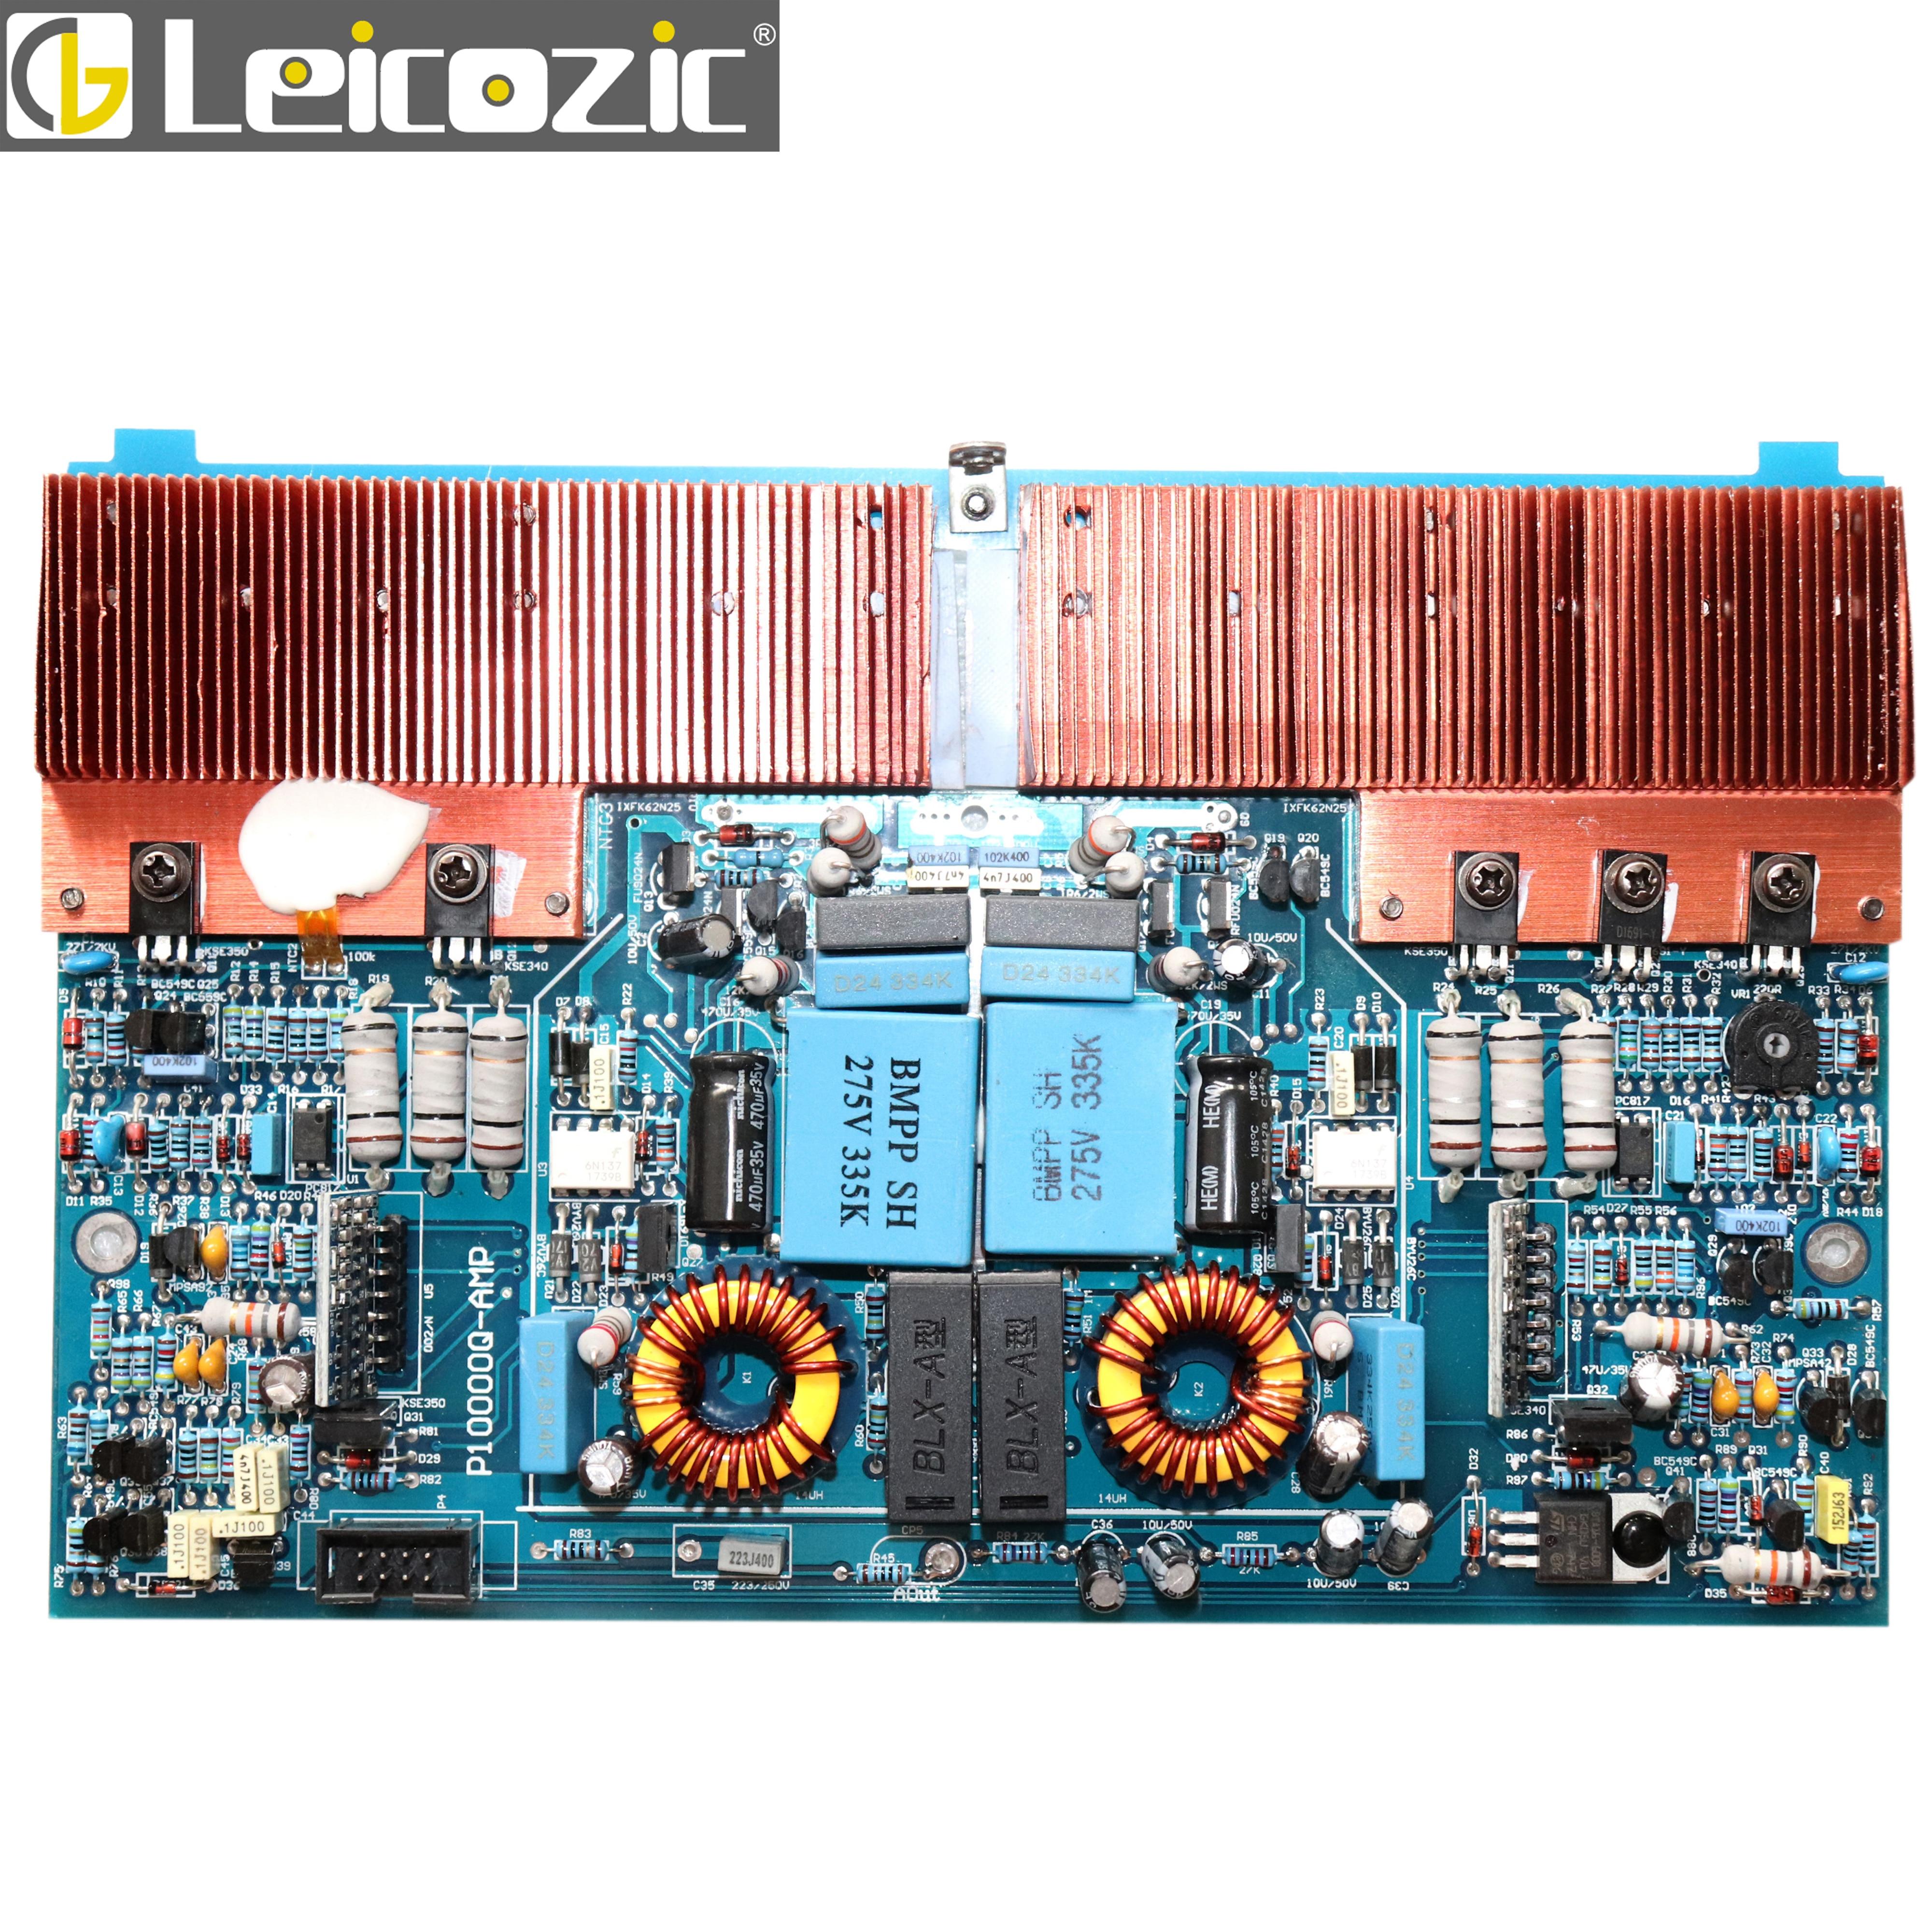 Amplifier Circuit Boardamplifier Circuit Boardamplifier Circuit